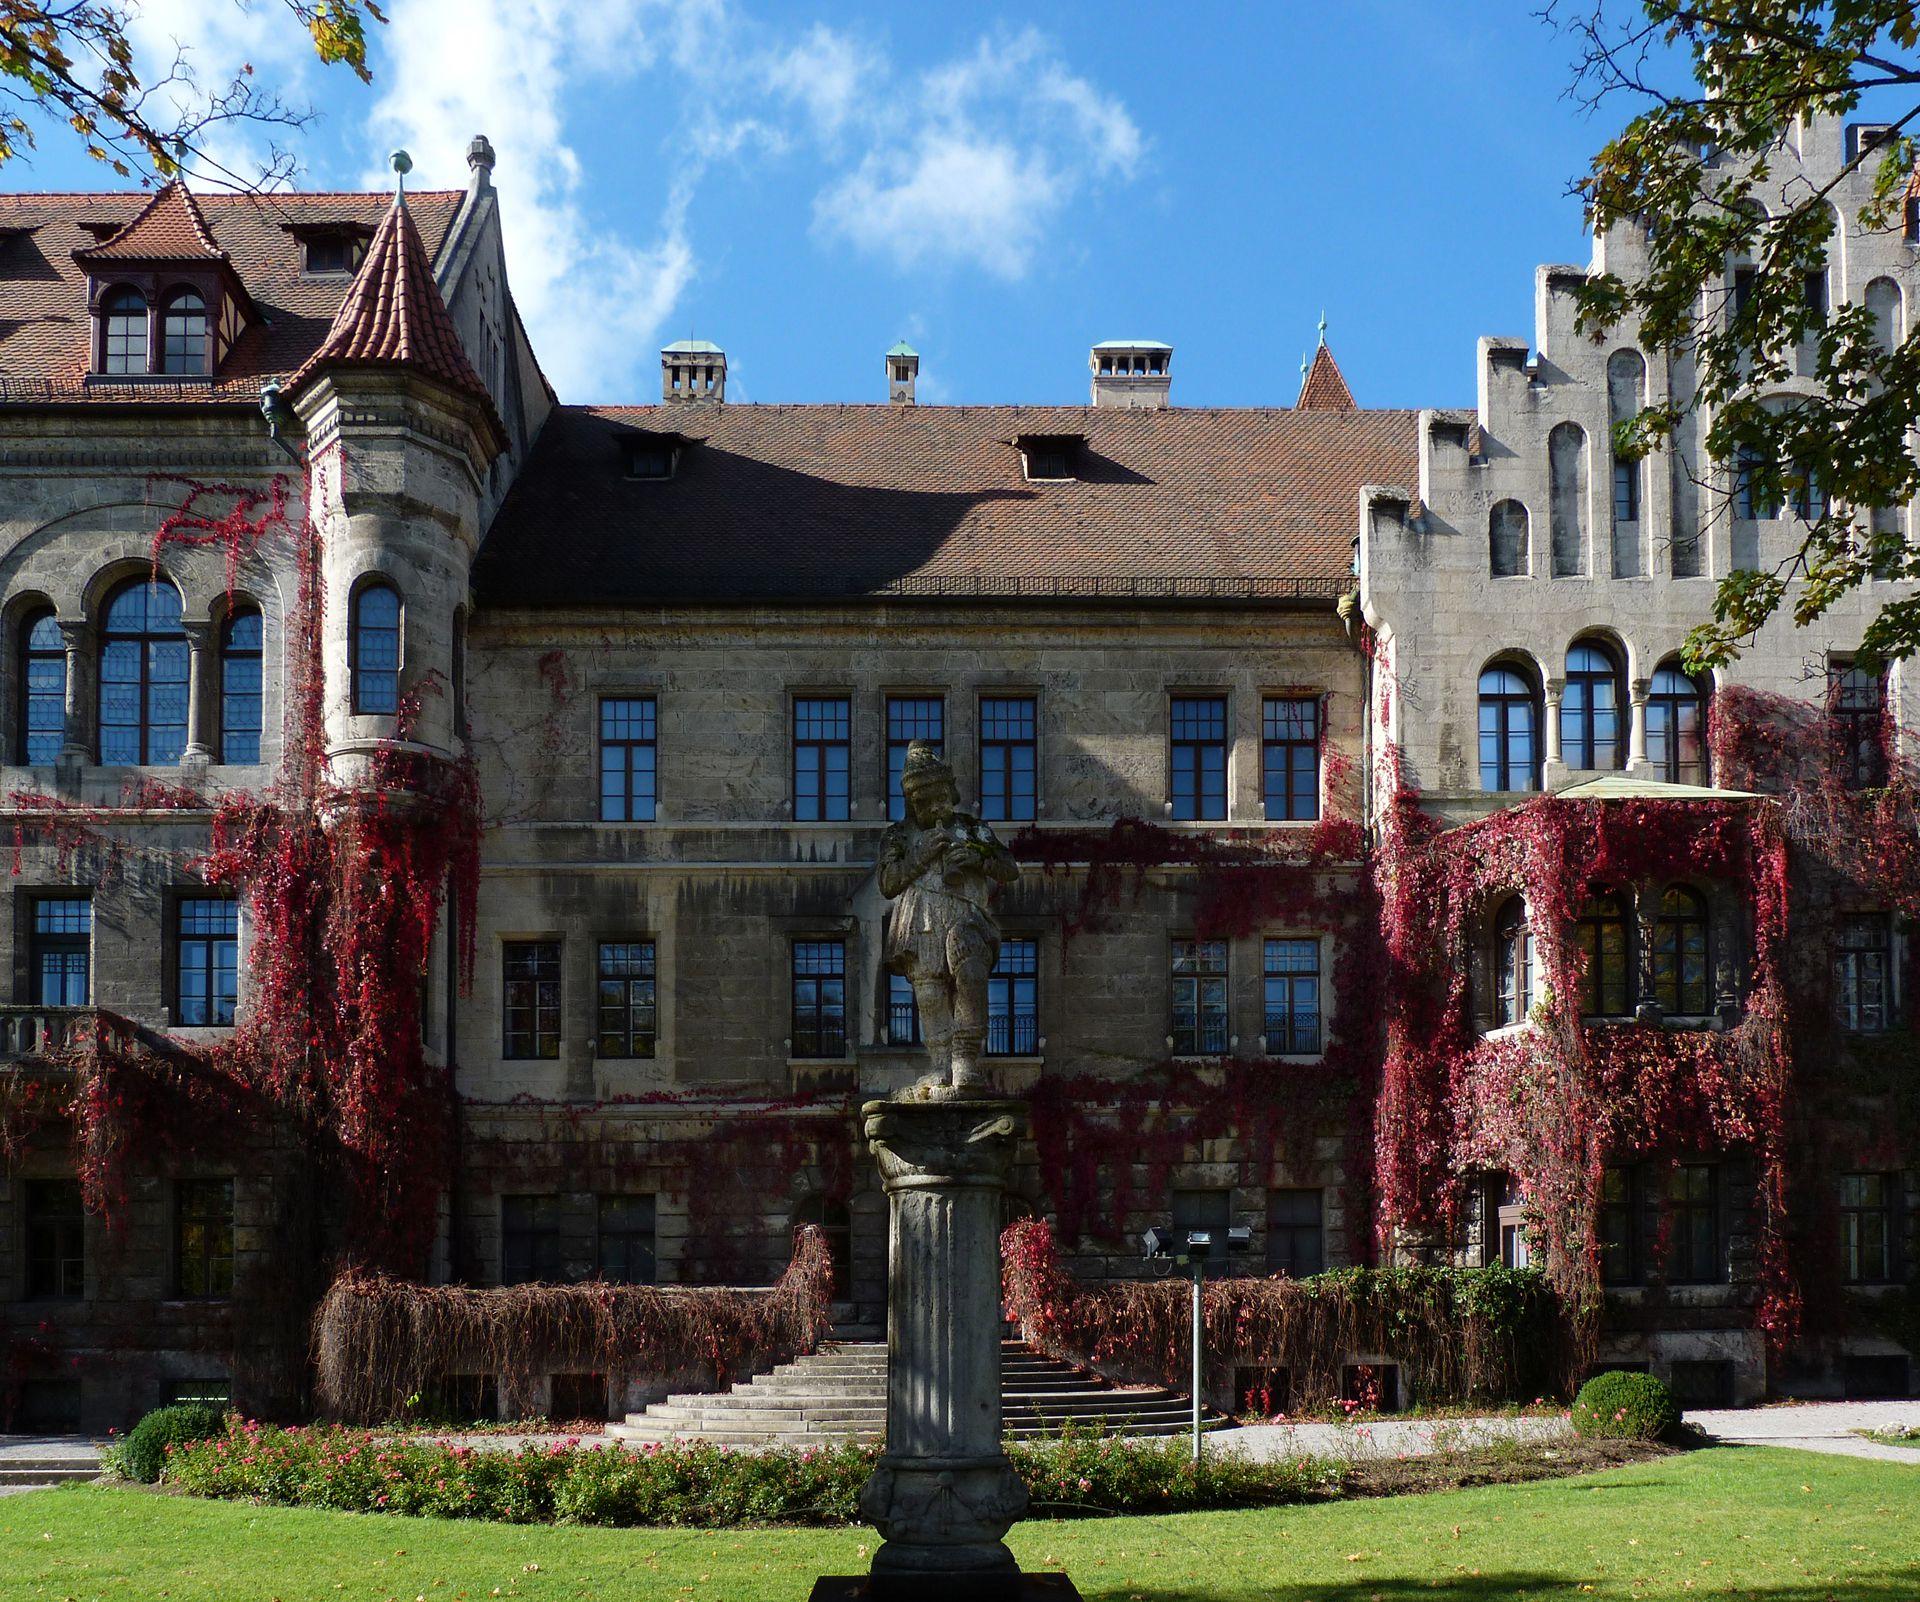 Schloss Faber-Castell Park, Südostansicht mit Brunnen